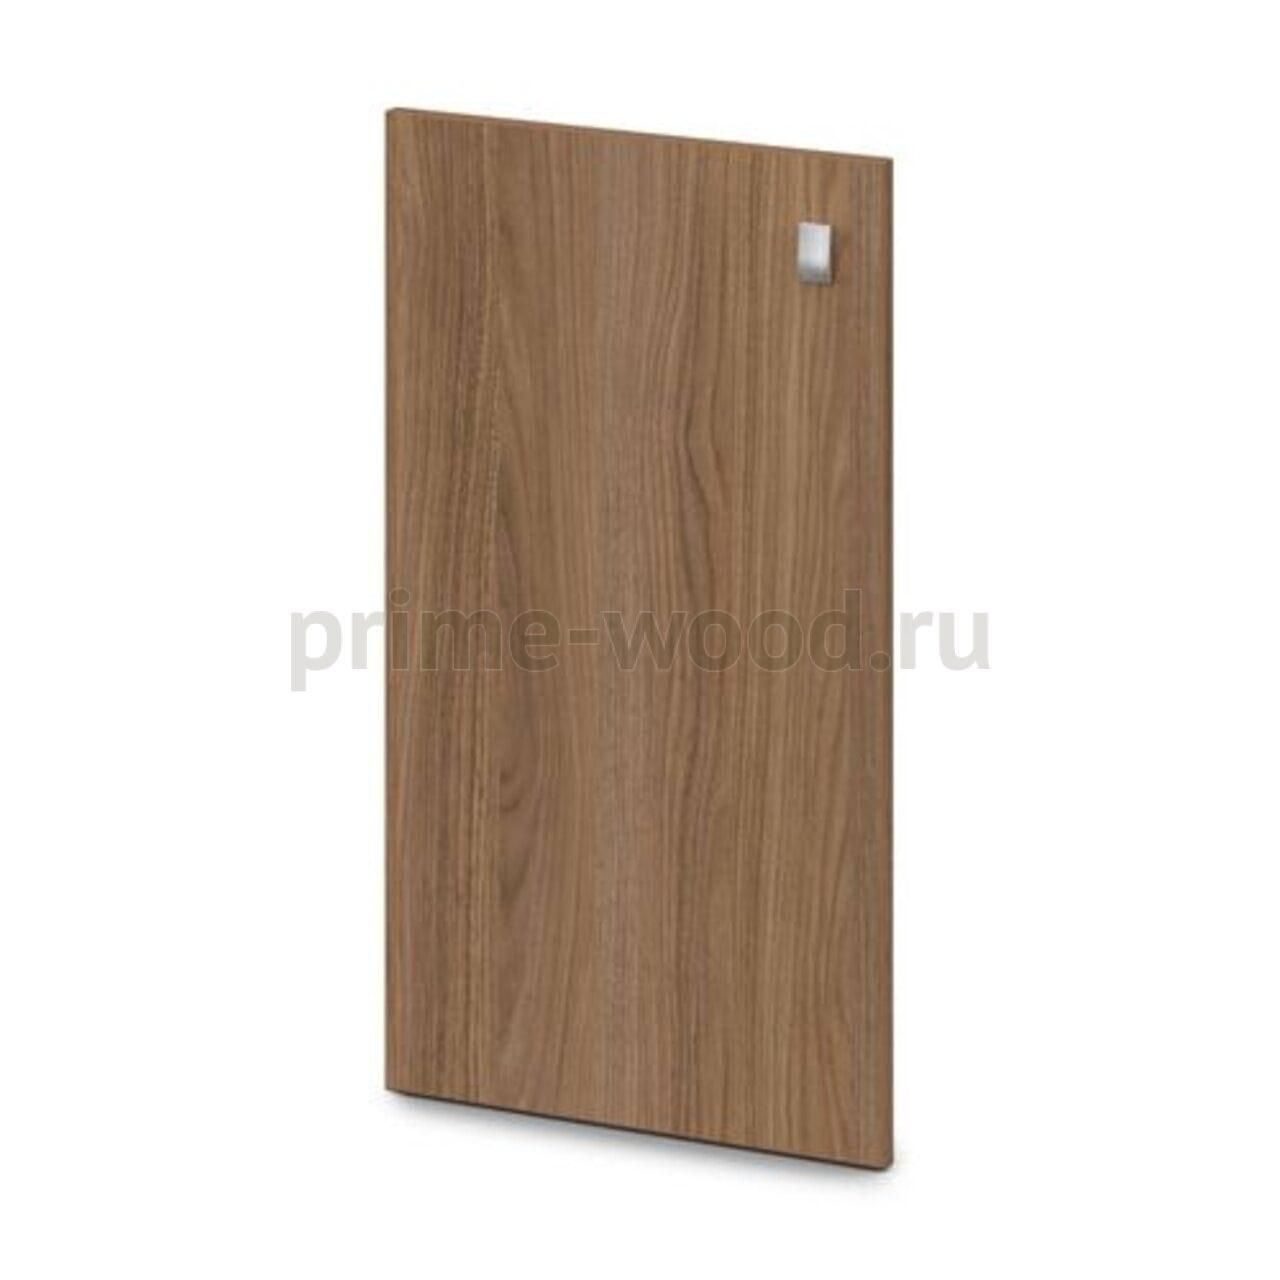 Дверь ЛДСП (левая) Vasanta 41x2x71 - фото 3